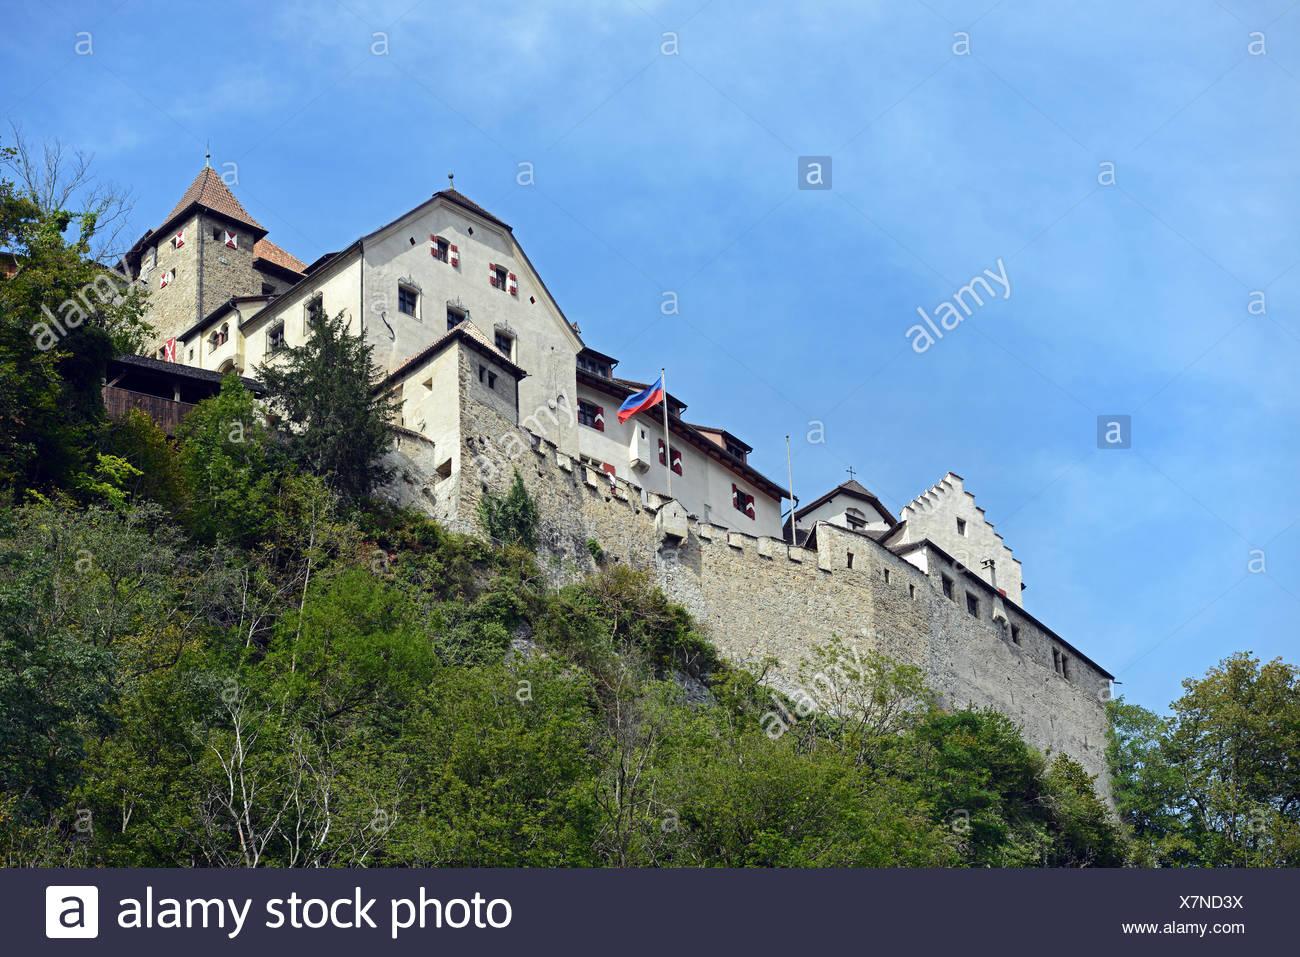 Schloss Liechtenstein / Liechtenstein Castle Stock Photo